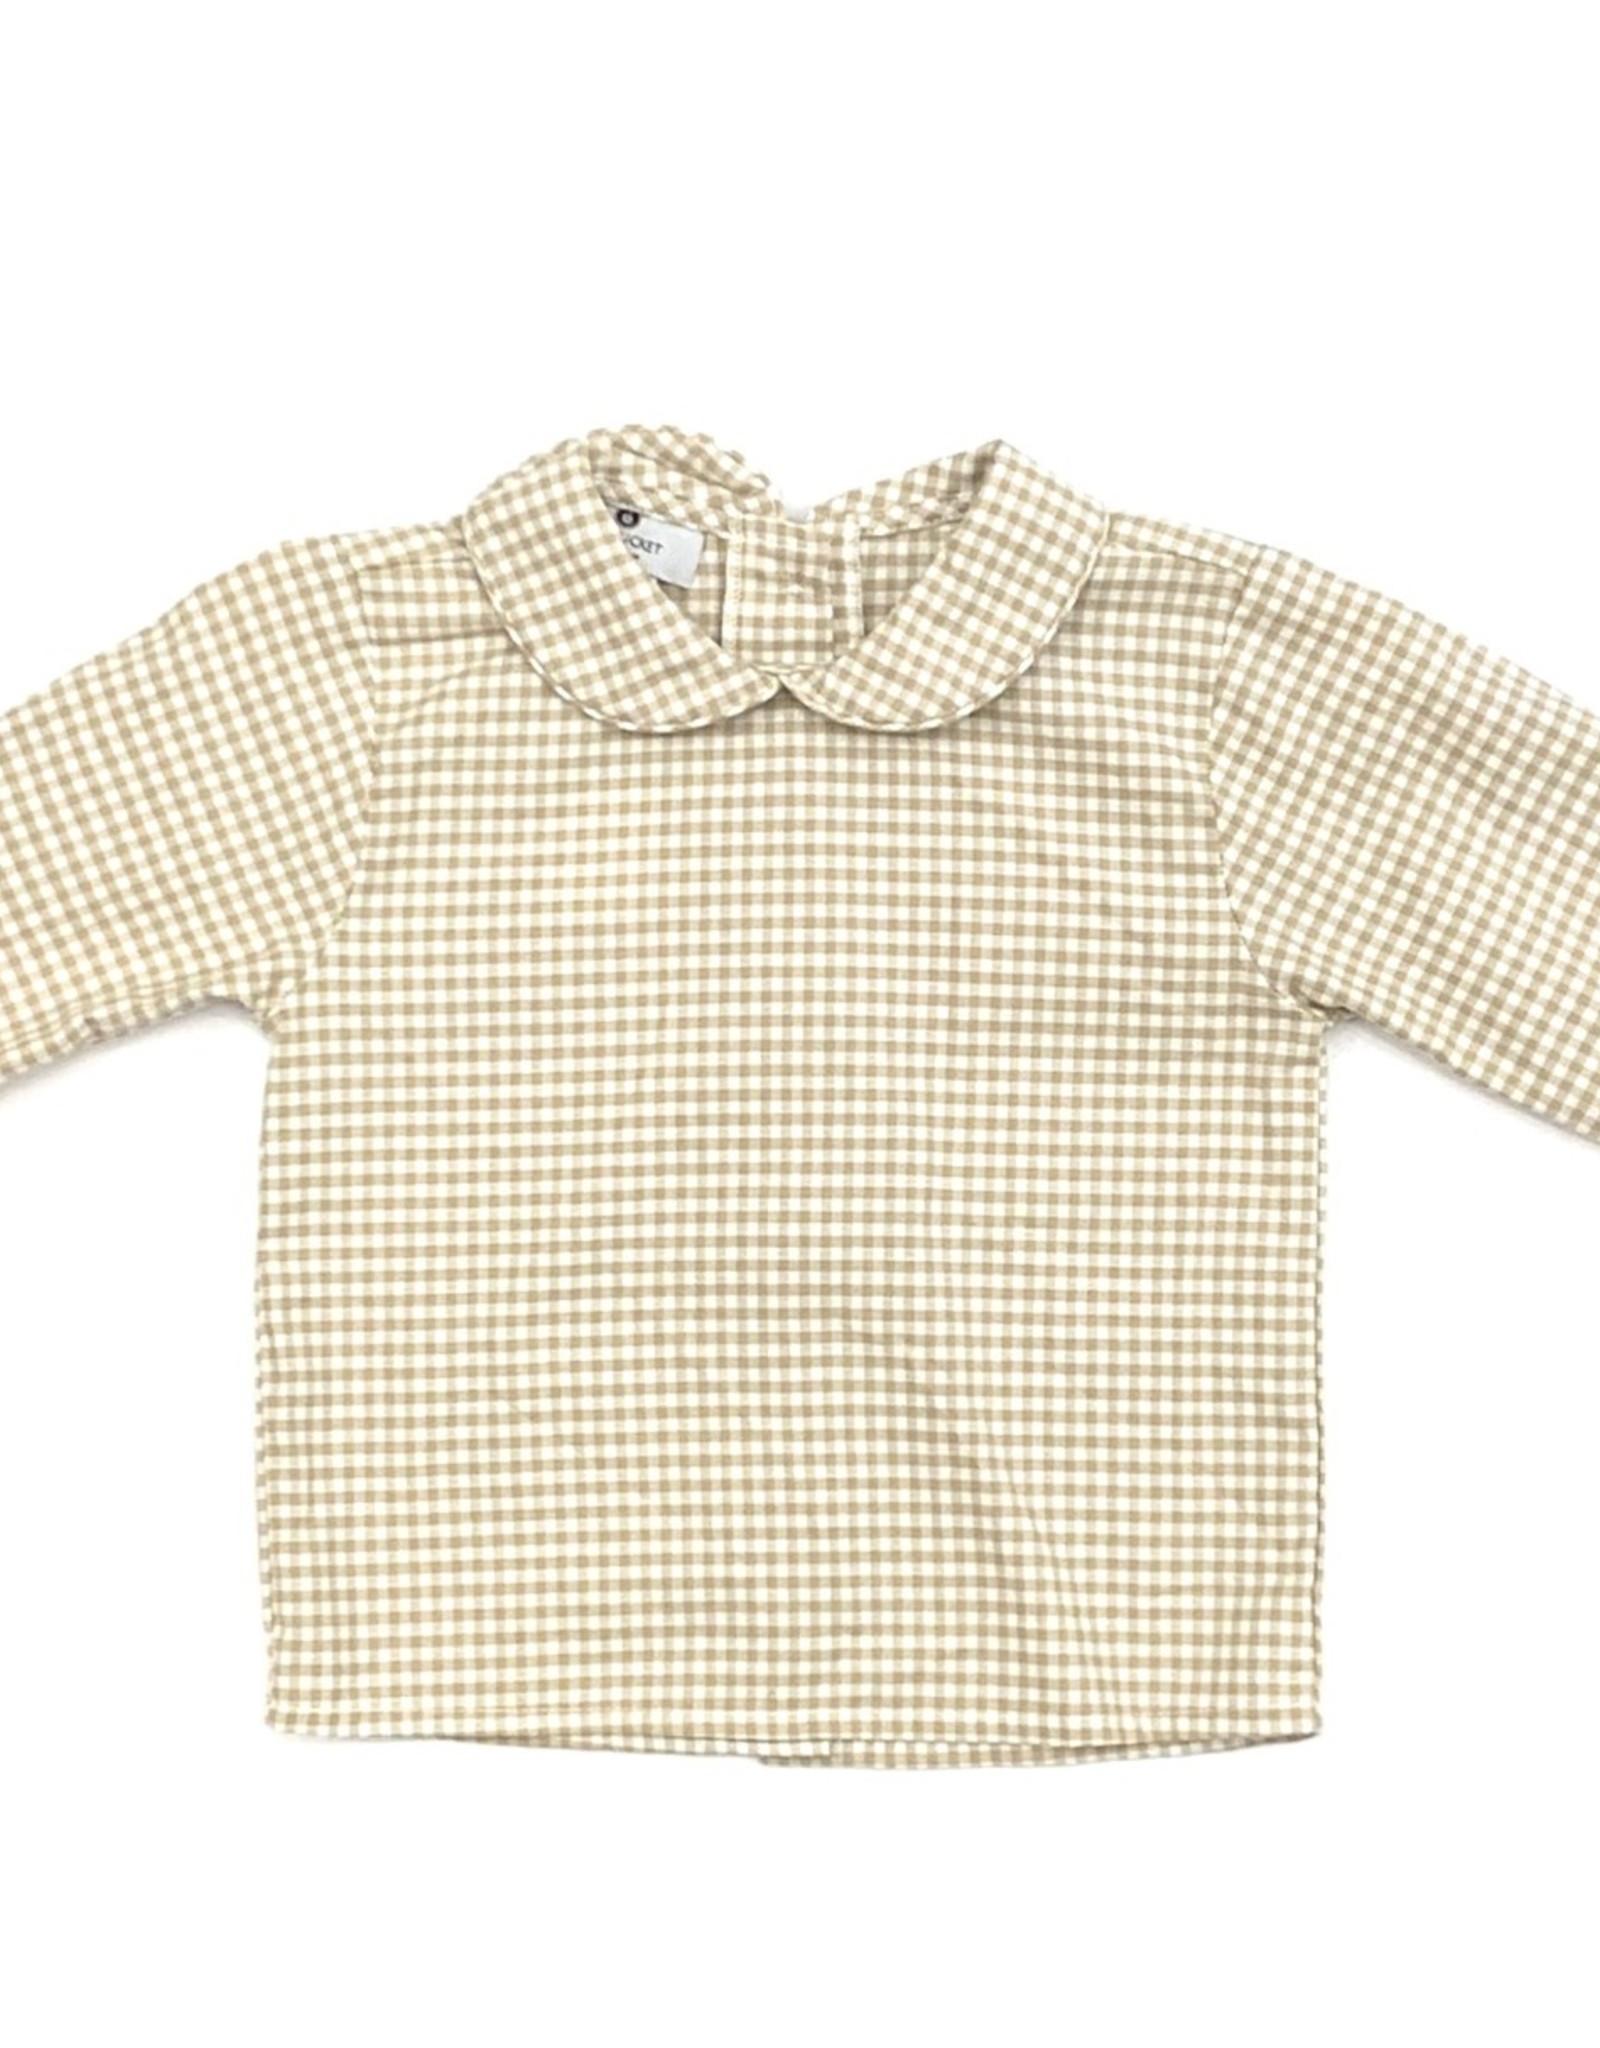 Nantucket Kids Peter Pan Collar Sand Gingham Long Sleeve